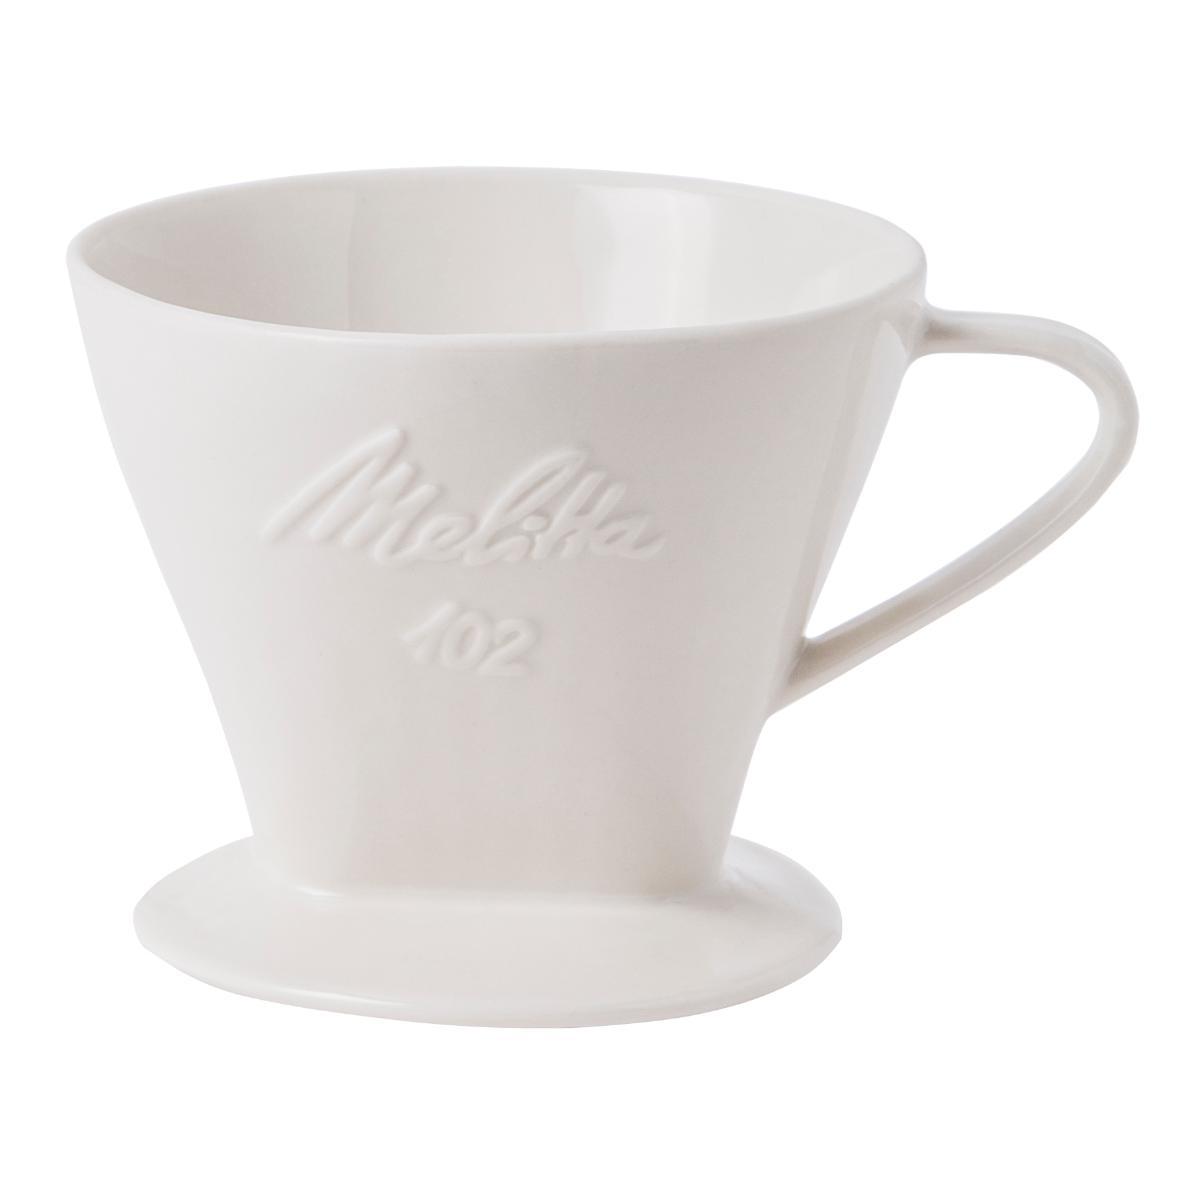 Suporte Para Filtro de Porcelana 102 Melitta